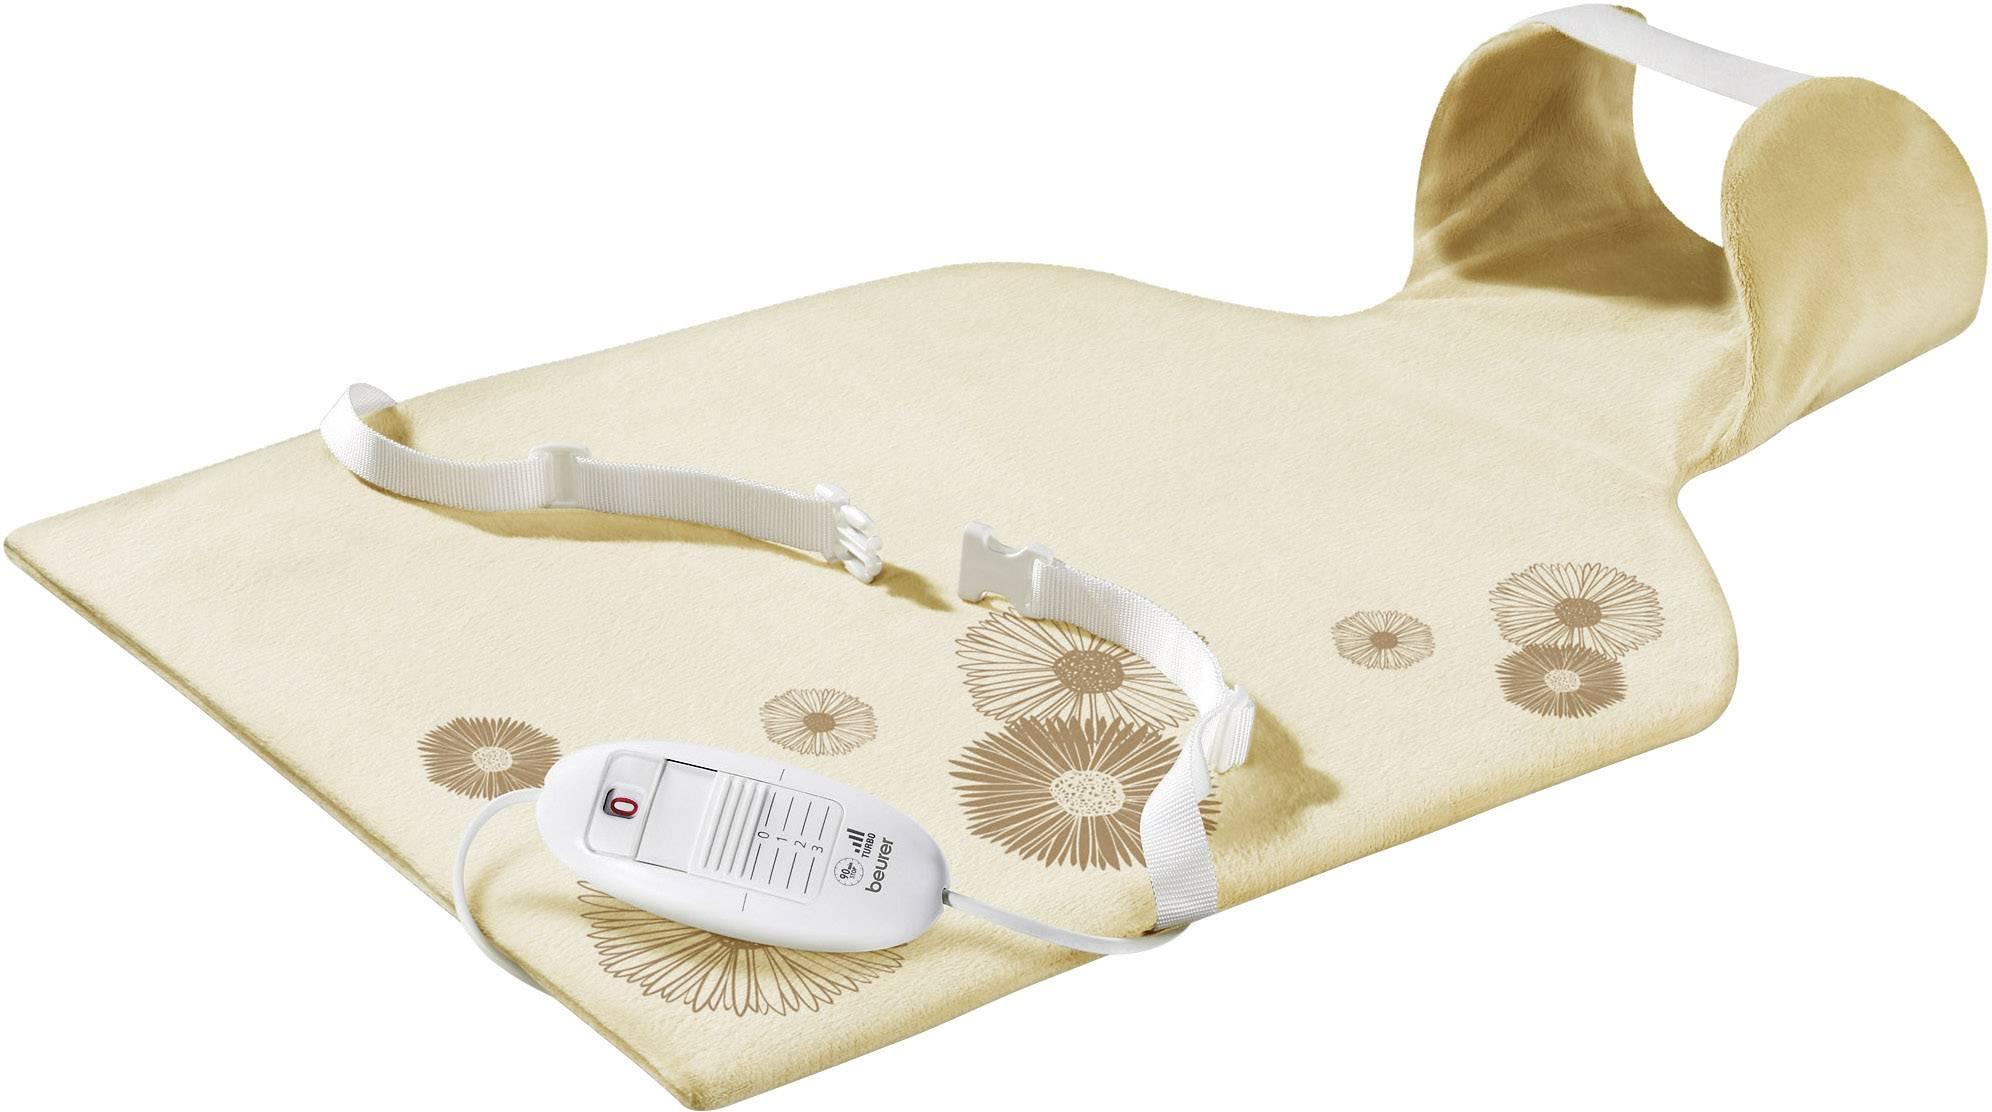 Vyhrievacia deka na chrbát a za krk Beurer HK 58 100 W béžová 62 cm x 42 cm